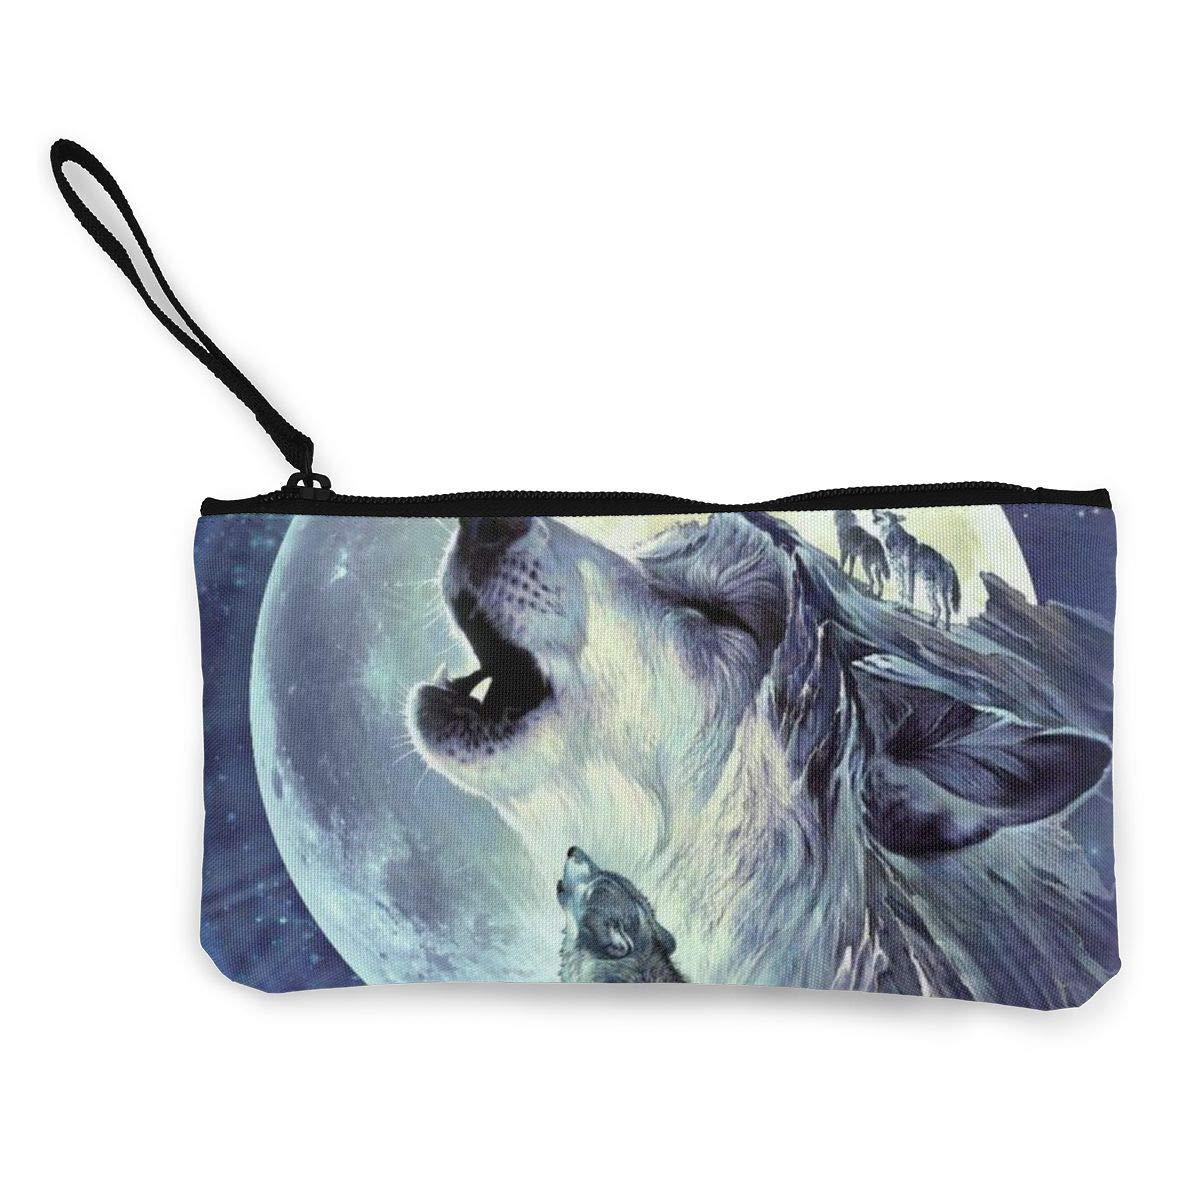 Canvas Cash Coin Purse,Wolf Spirit And Moon/ Print Make Up Bag Zipper Small Purse Wallets